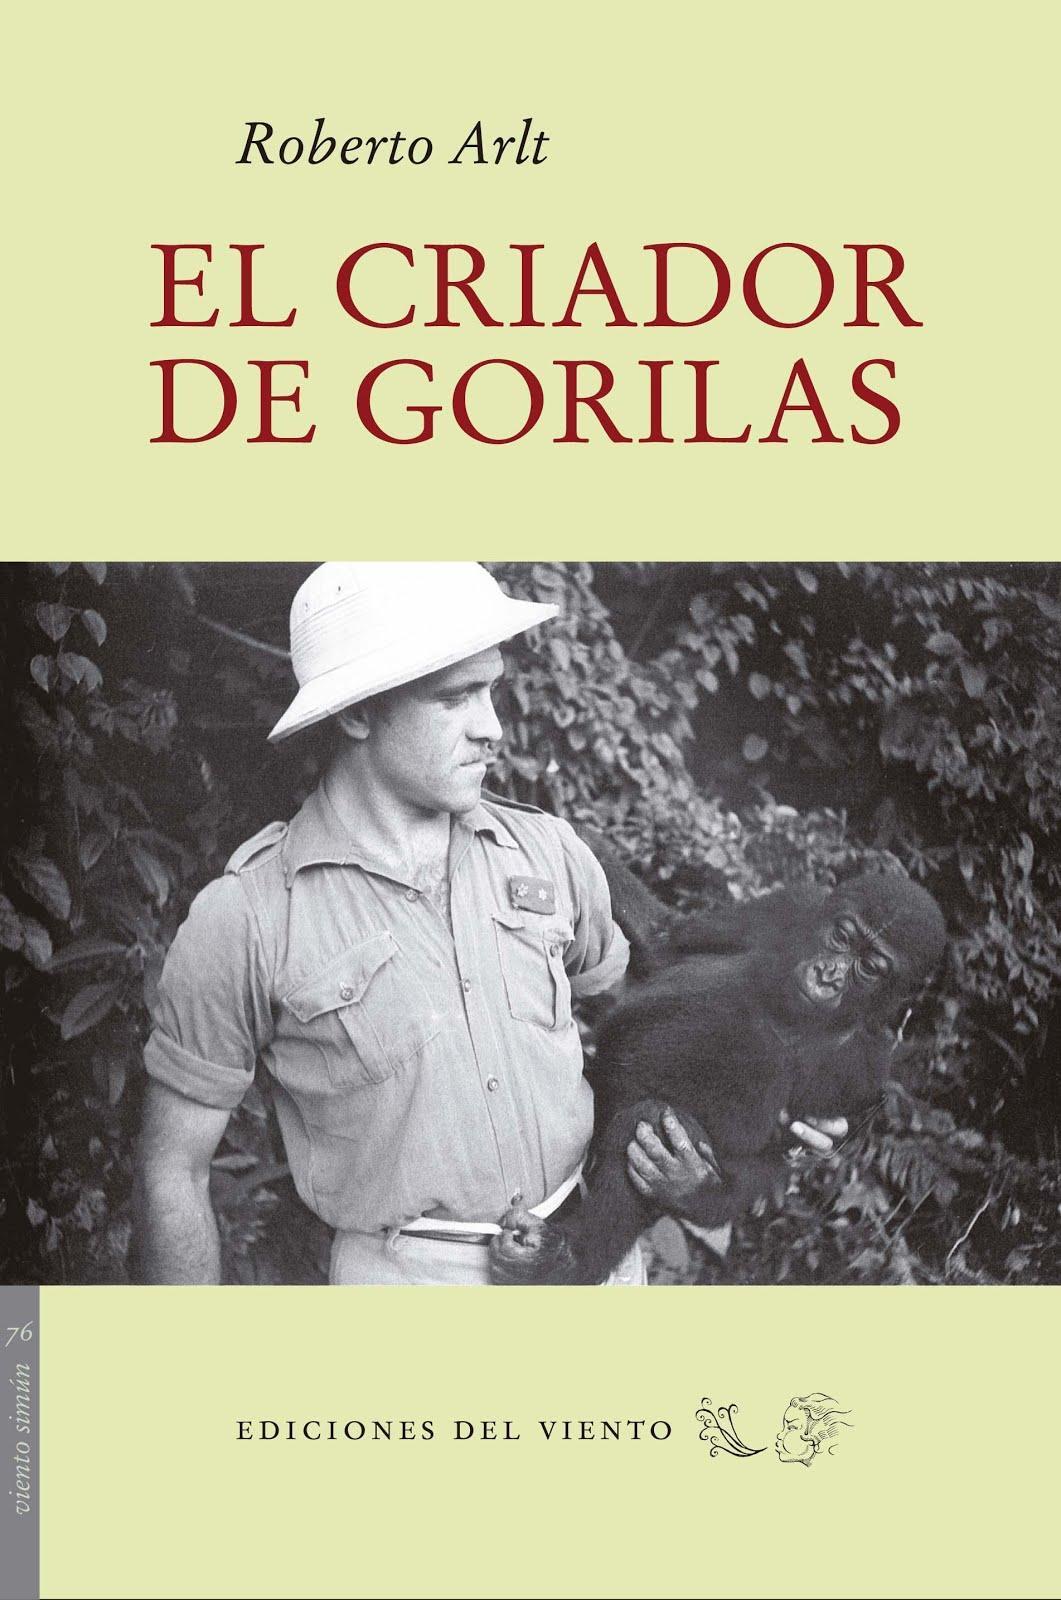 http://4.bp.blogspot.com/-TRUJkePpM9g/URY1HvlJvuI/AAAAAAAAHyU/Mu_bFynX3PM/s1600/el-criador-de-gorilas.jpg